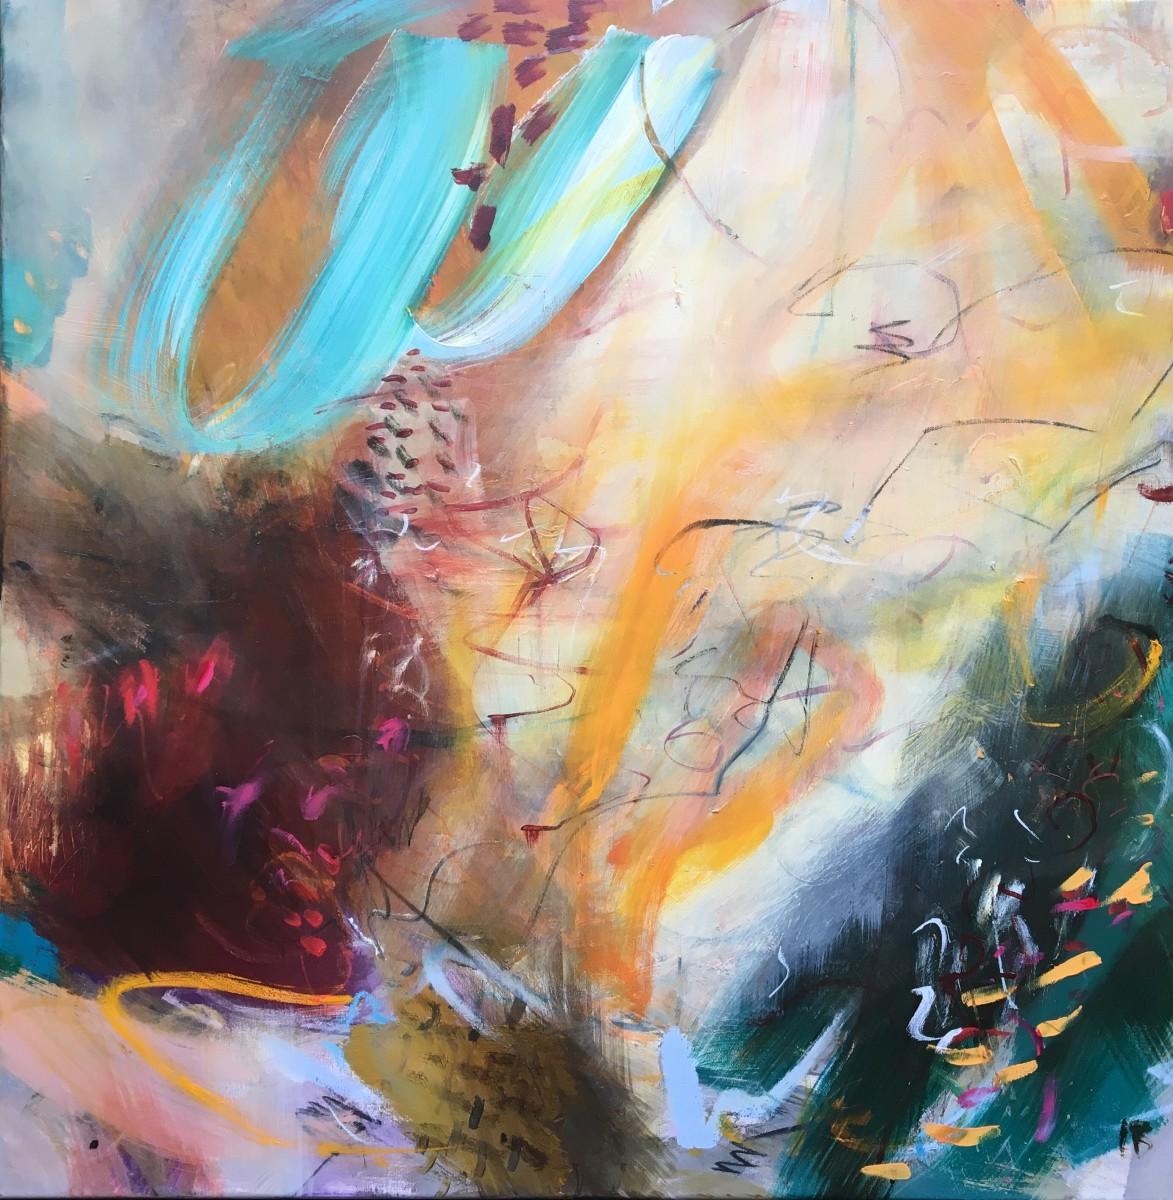 Flurry by Lesley Birch